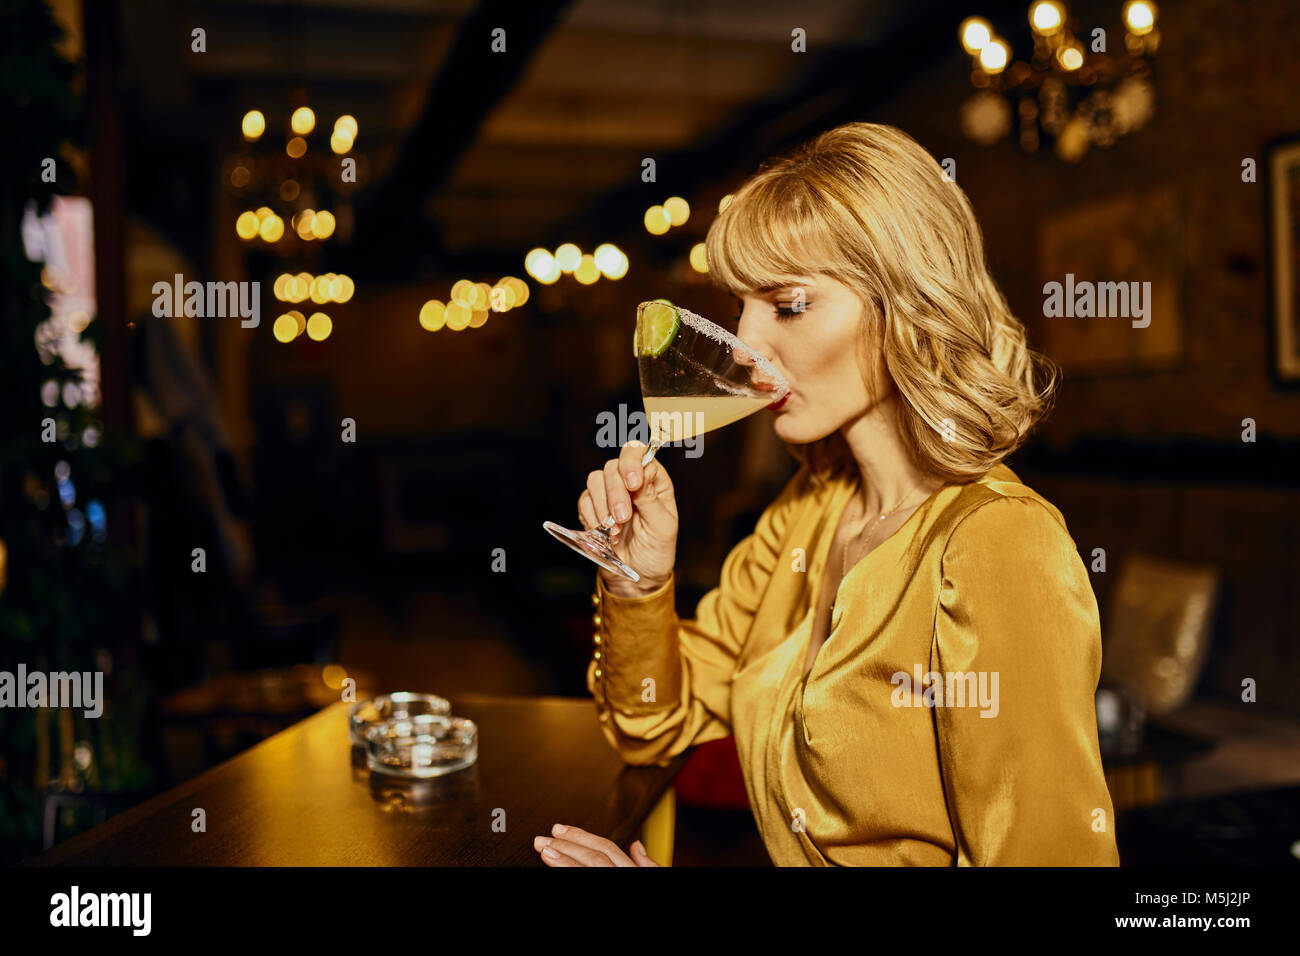 Elegante Frau trinkt Cocktail in einer Bar Stockbild